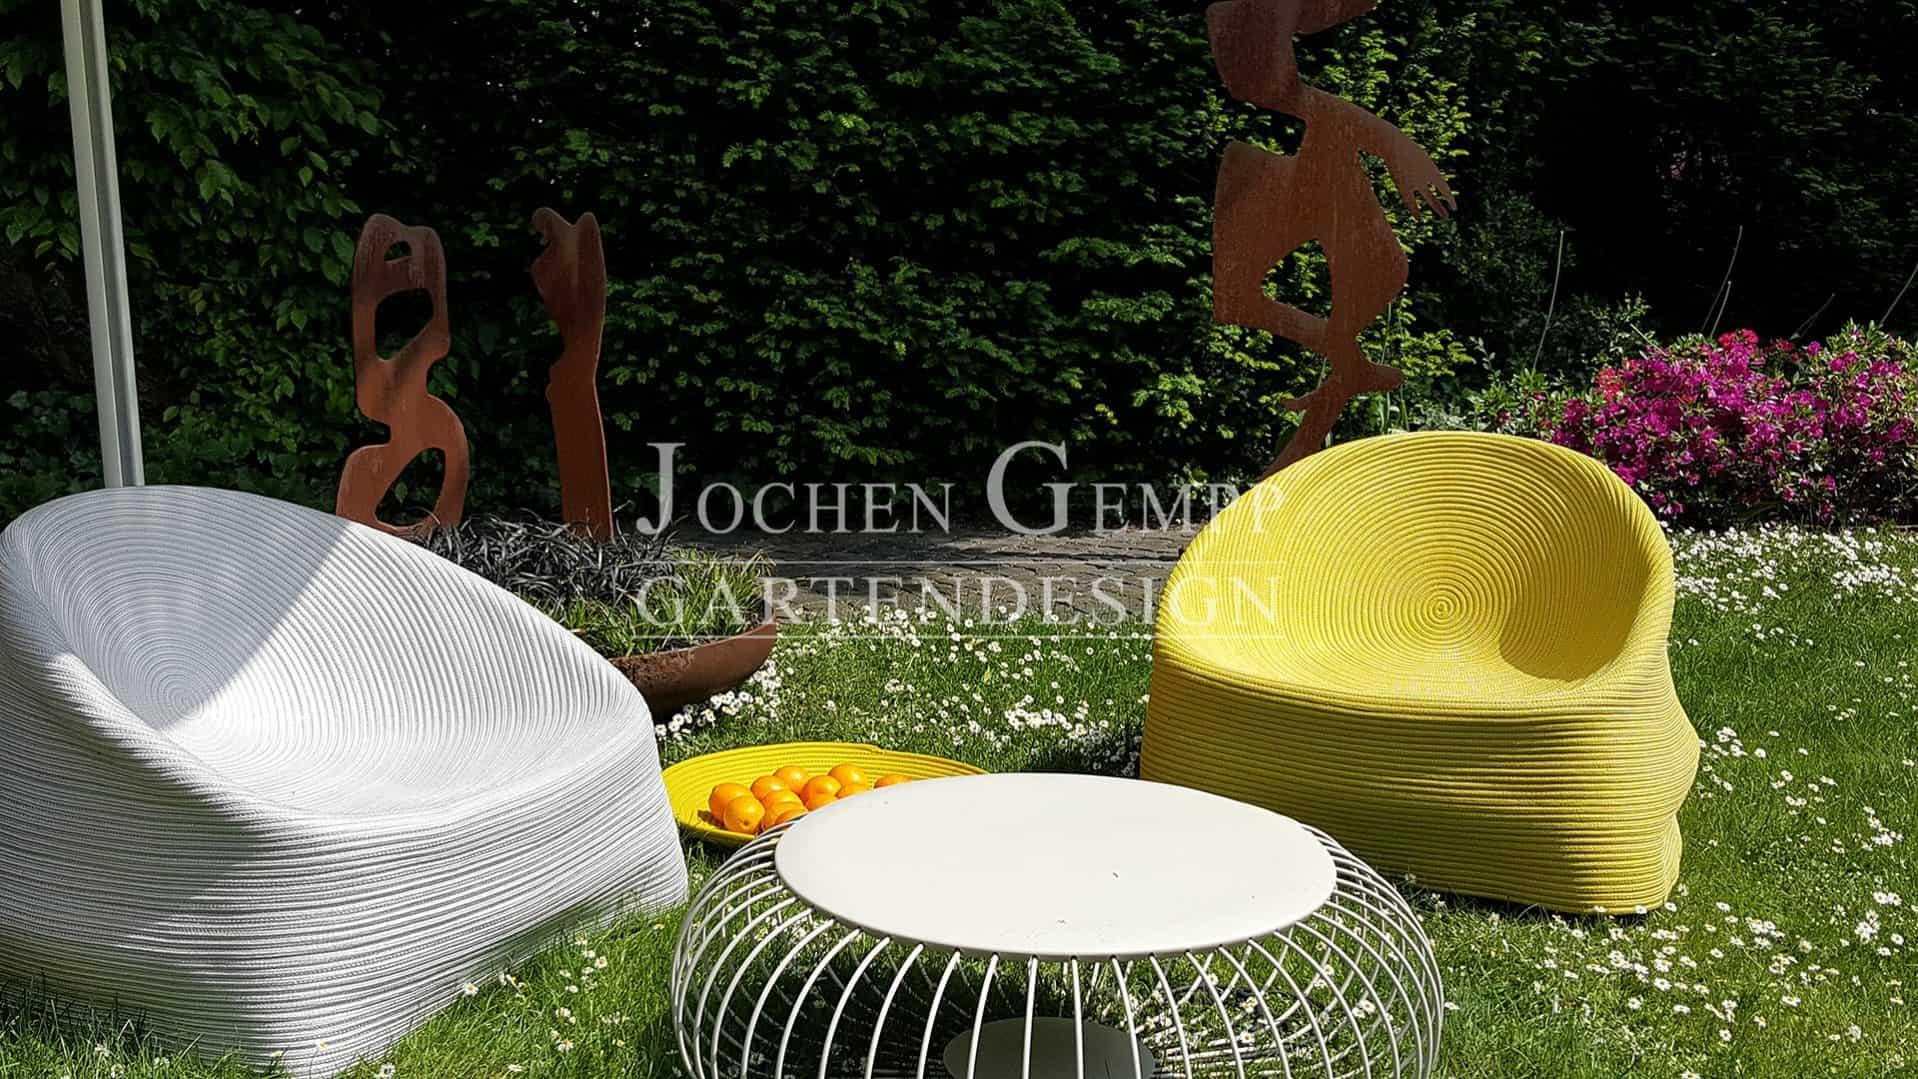 zeitloser skulpturengarten gartengestaltung hamburg gempp gartendesign. Black Bedroom Furniture Sets. Home Design Ideas